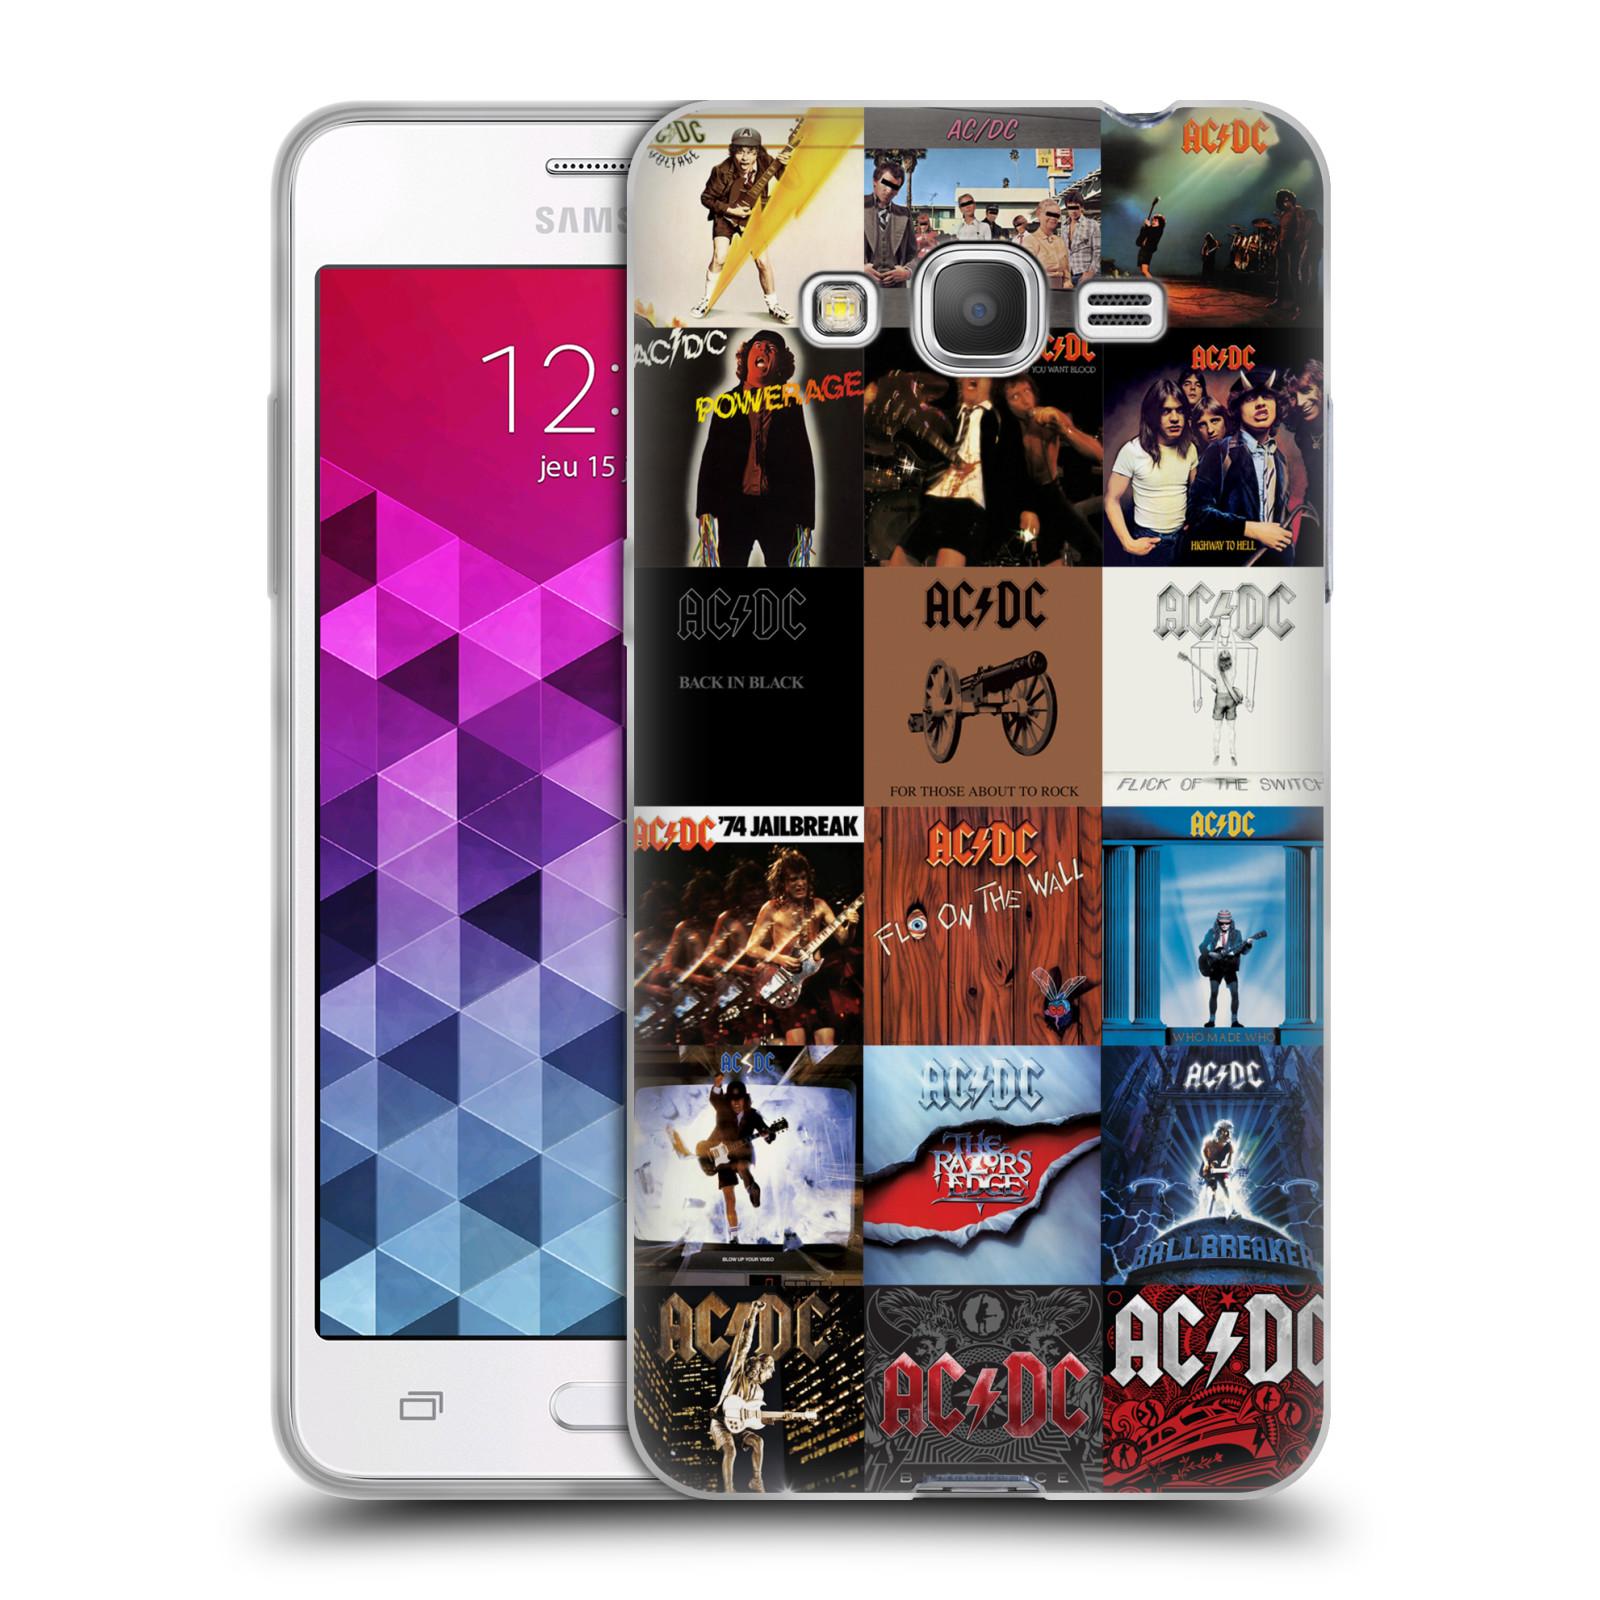 HEAD CASE silikonový obal na mobil Samsung Galaxy Grand Prime rocková skupina ACDC seznam alba